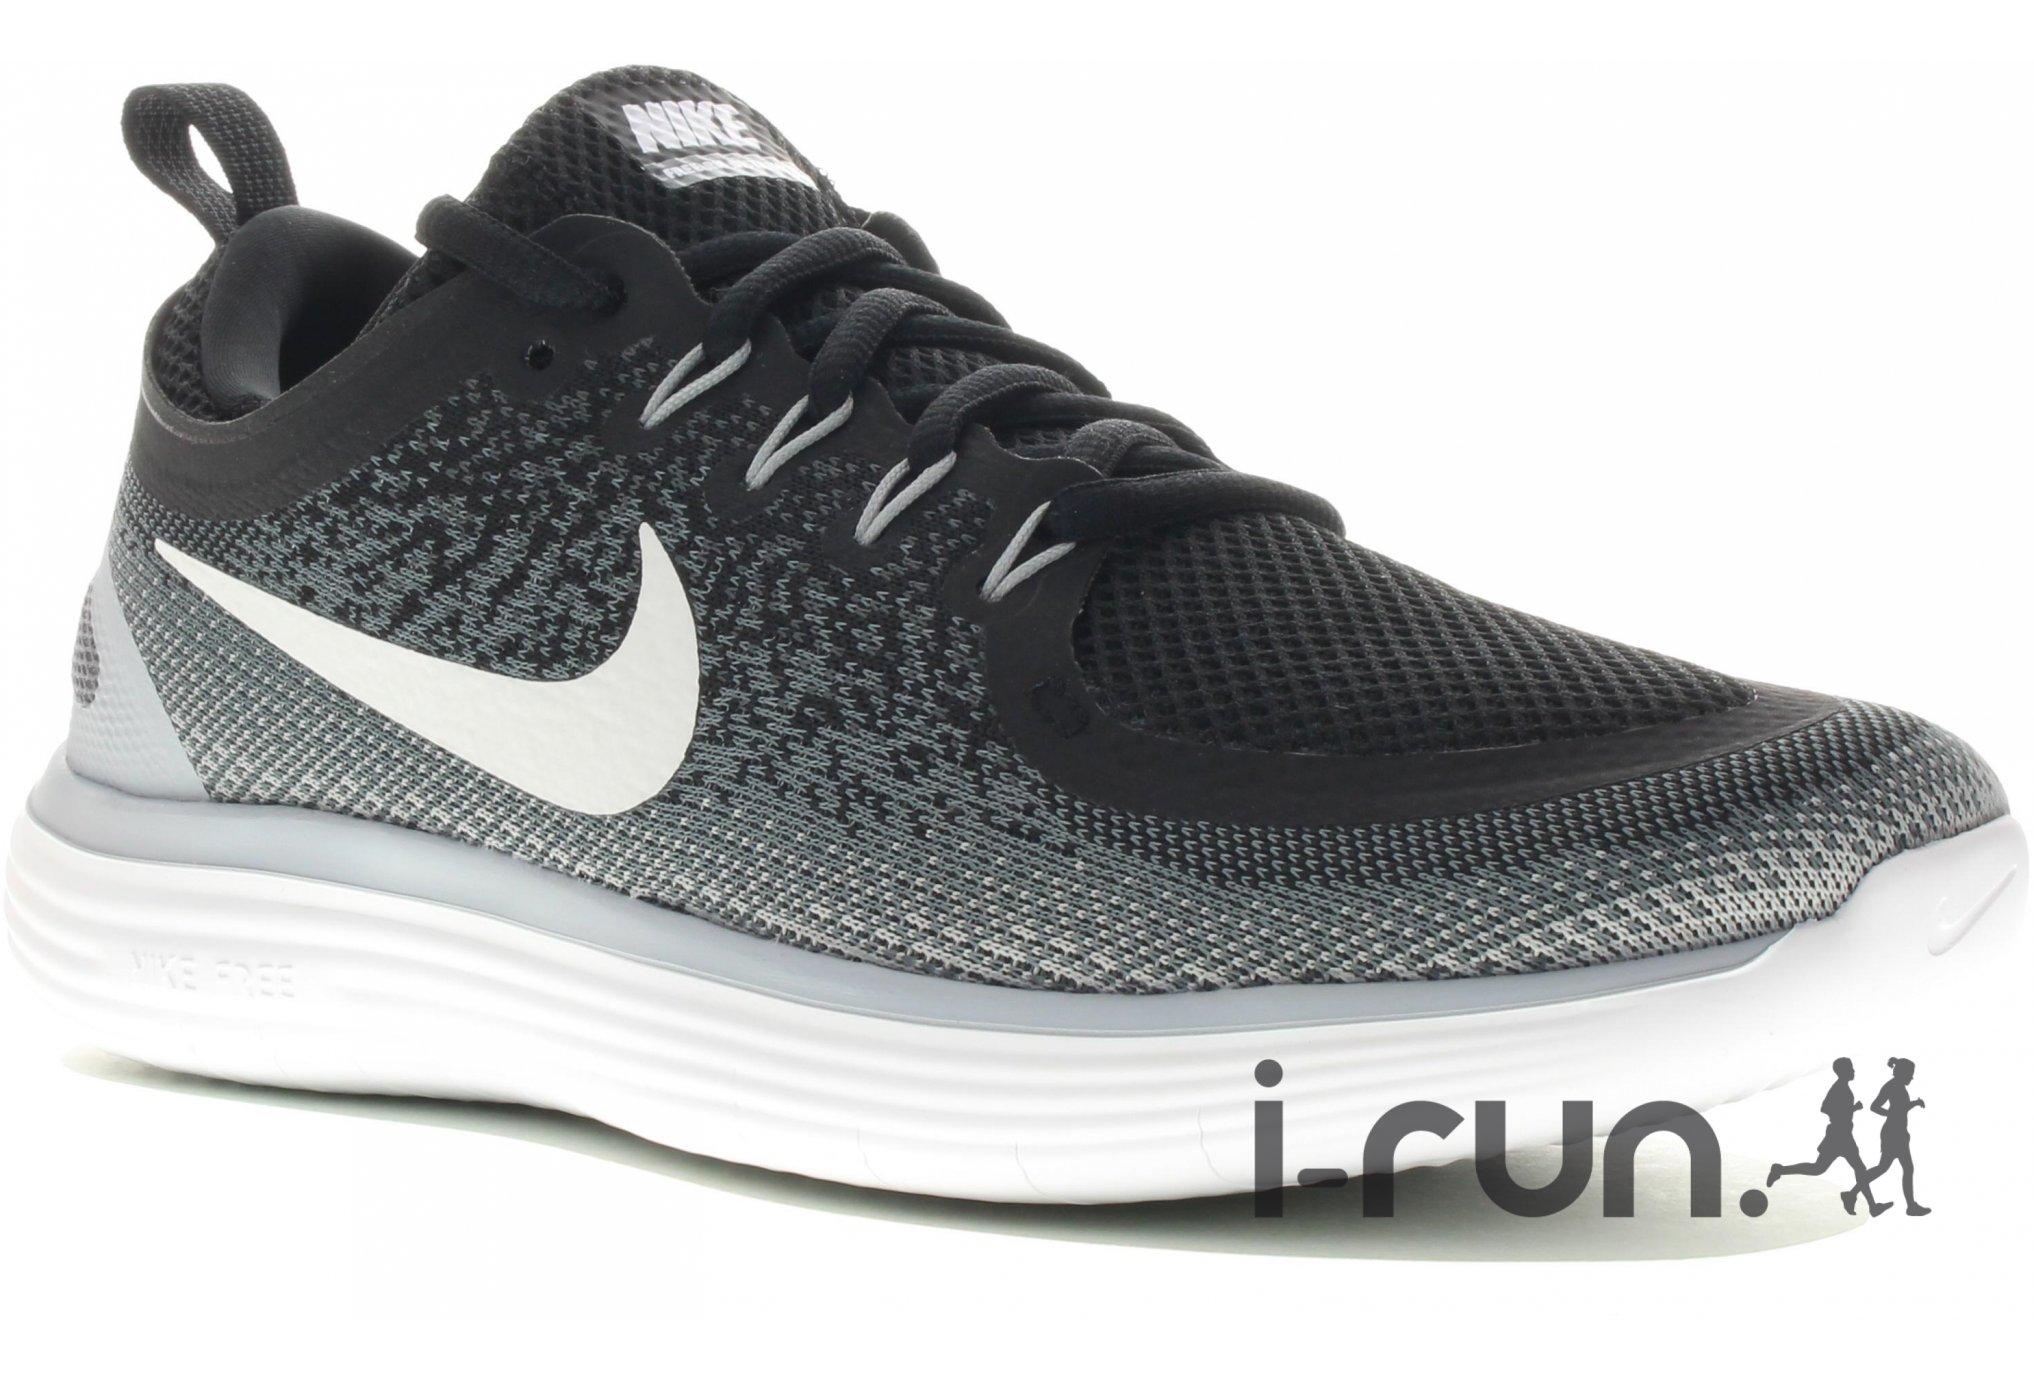 size 40 6f29b 31b4f Nike pas cher   Promos de -8% à -80%   SPOT-A-SHOP